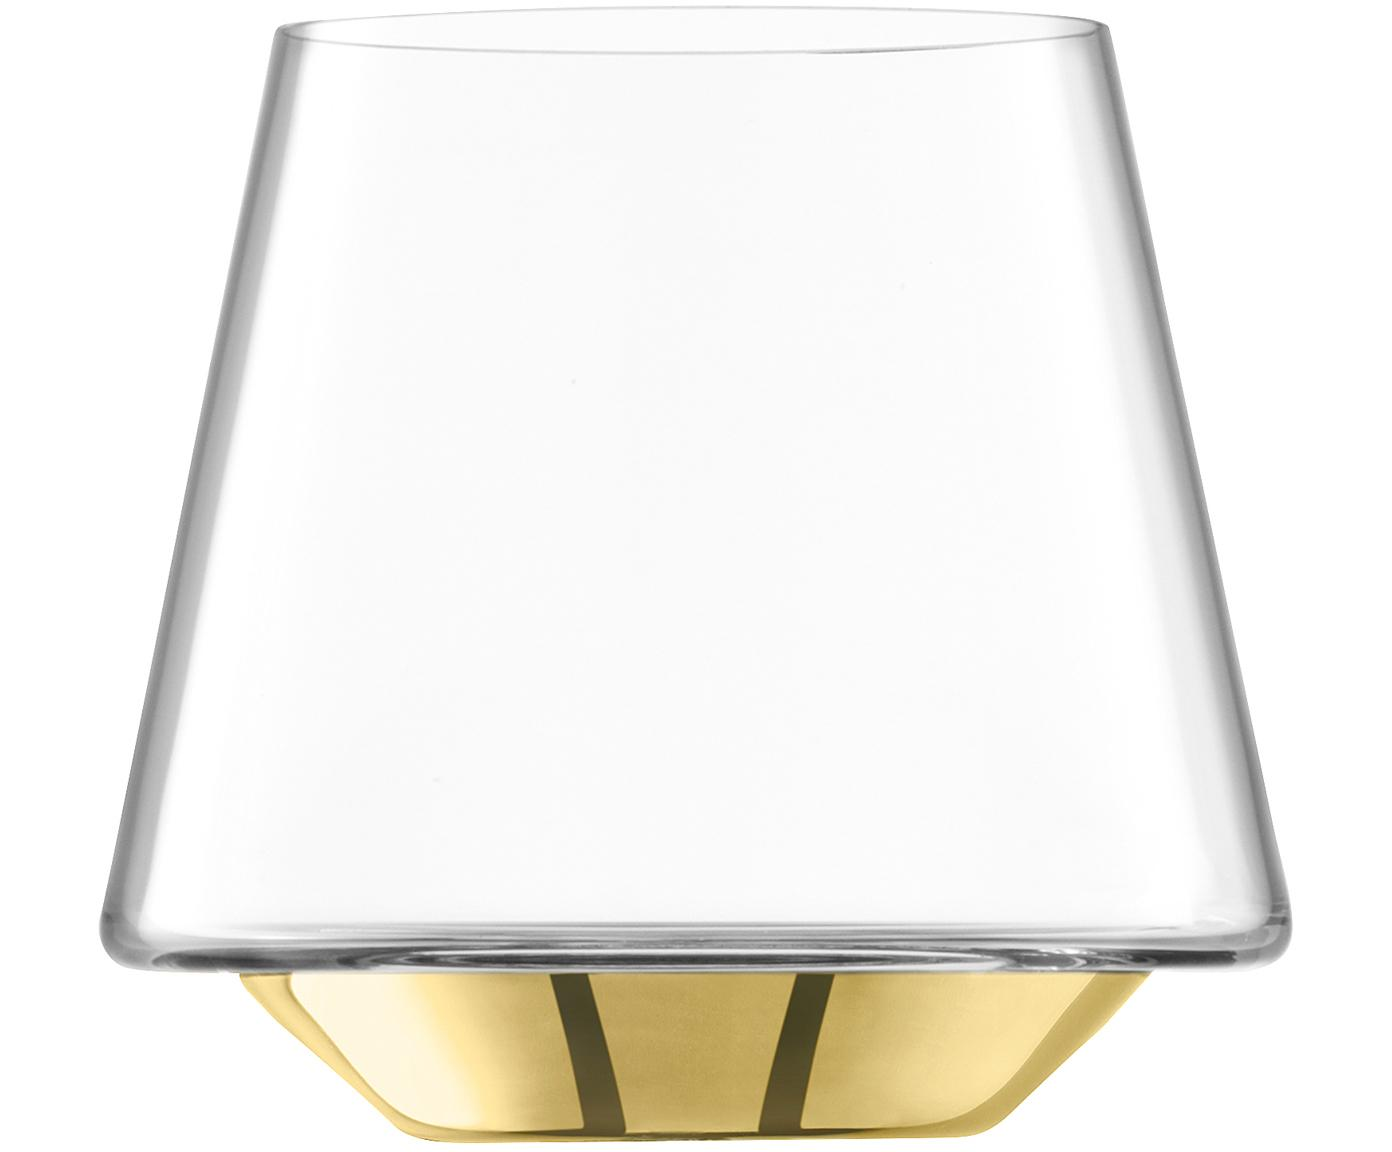 Mondgeblazen waterglazen Space, 2 stuks, Glas, Transparant, goudkleurig, Ø 10 x H 9 cm